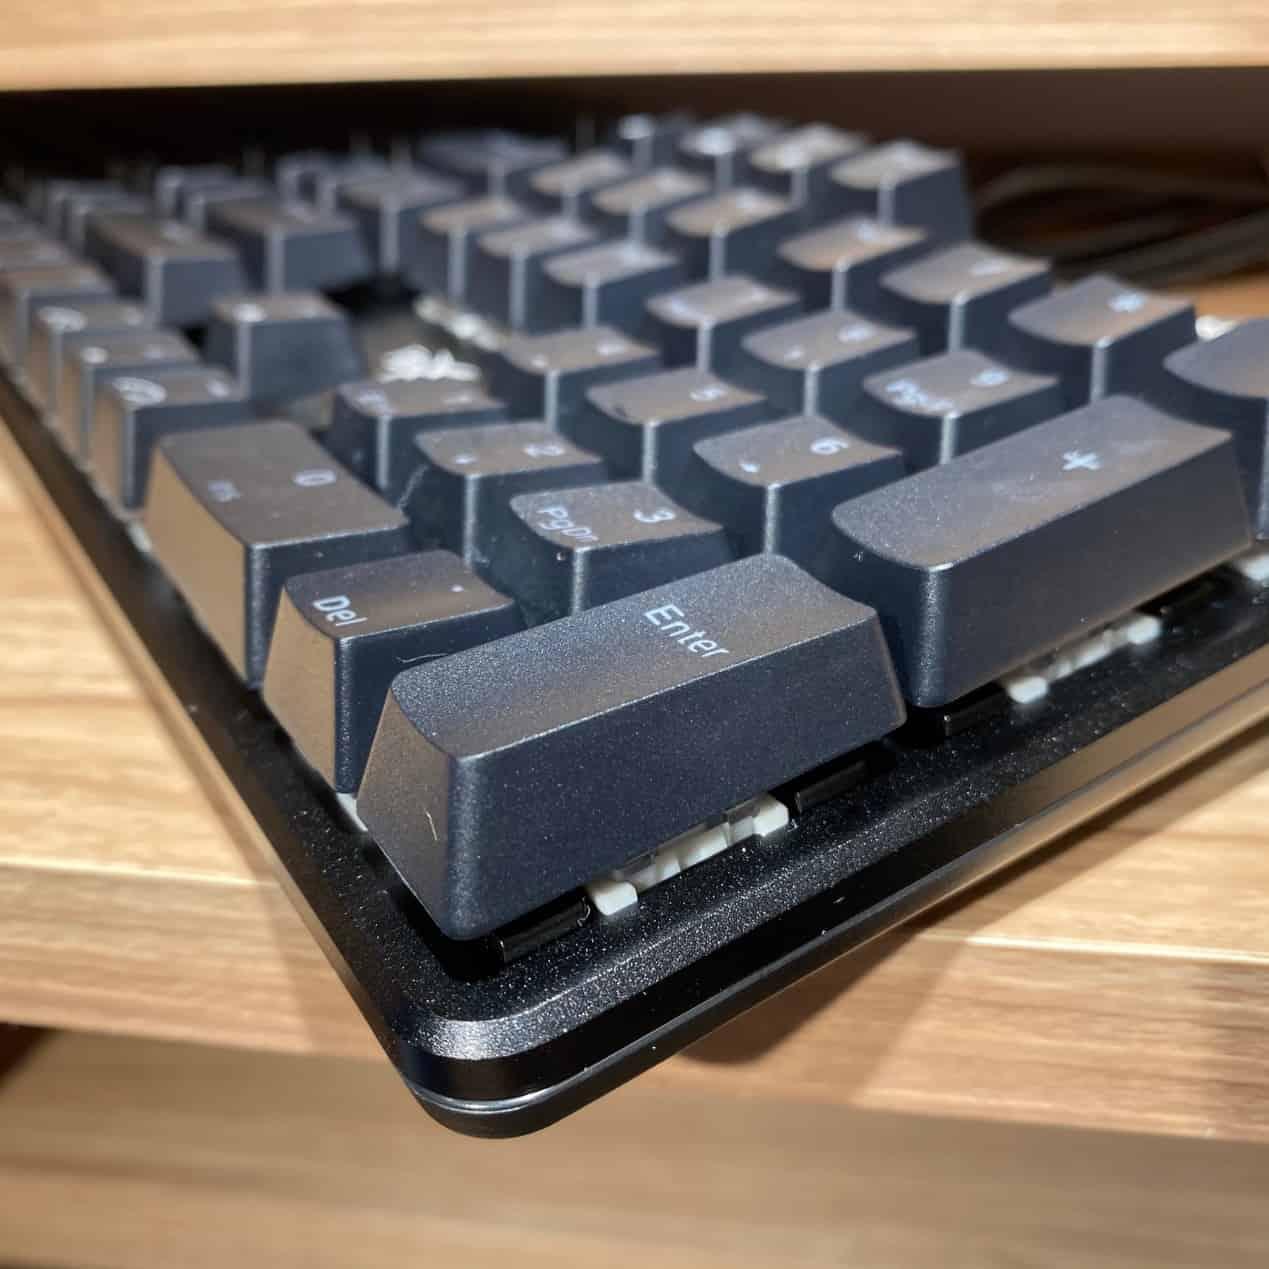 FXR-HKM-61旋音戰狐機械電競鍵盤-楊極鋁合金上蓋